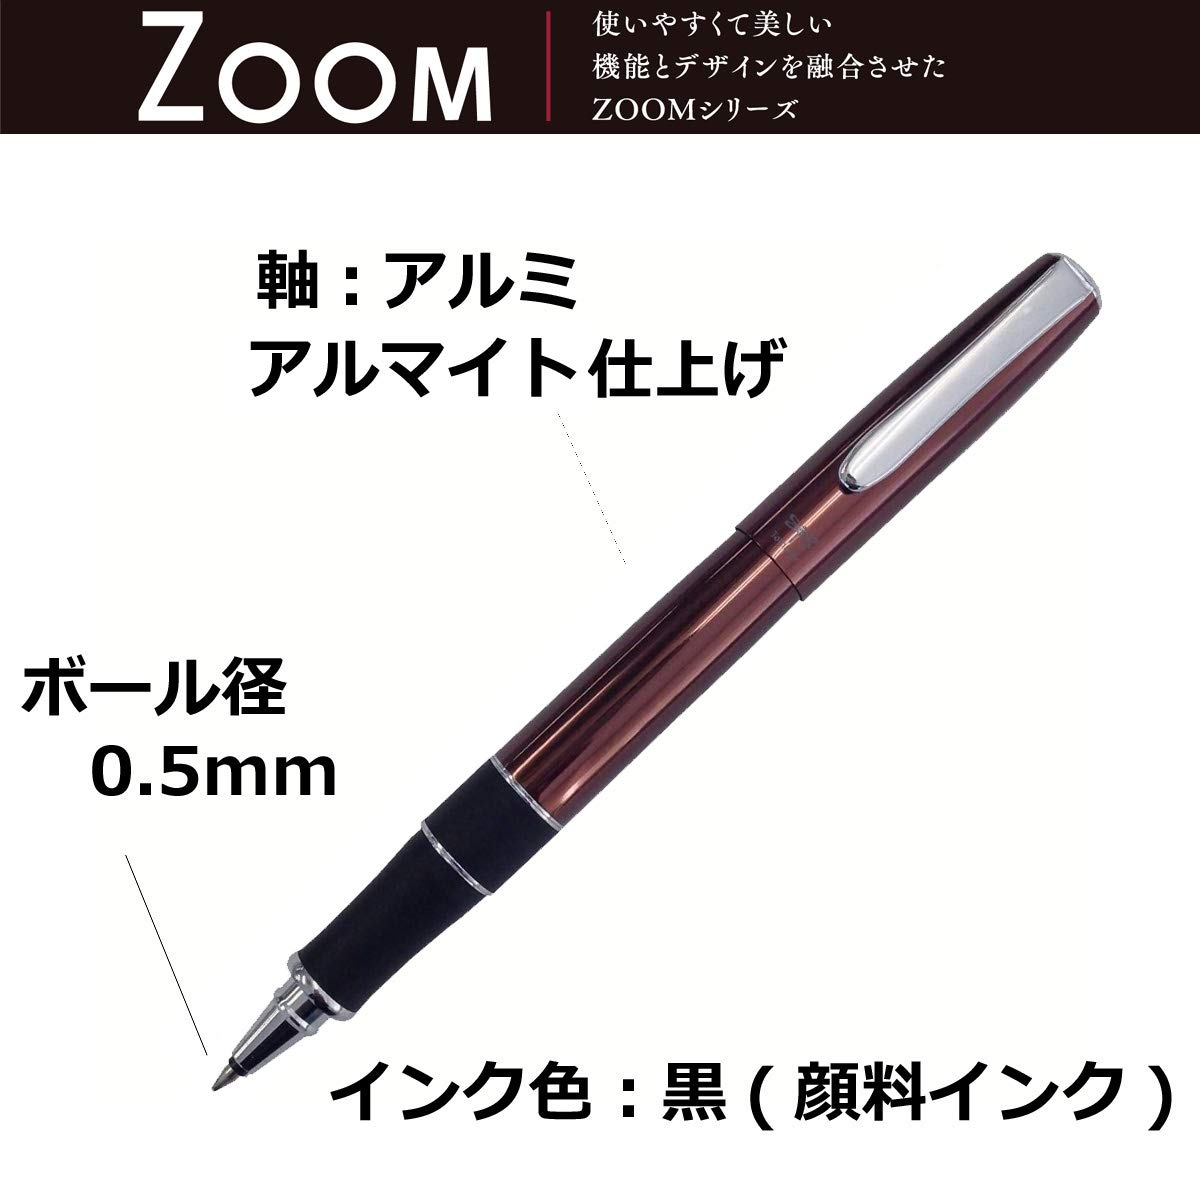 color plata de la marca Tombow Bol/ígrafo Zoom 505